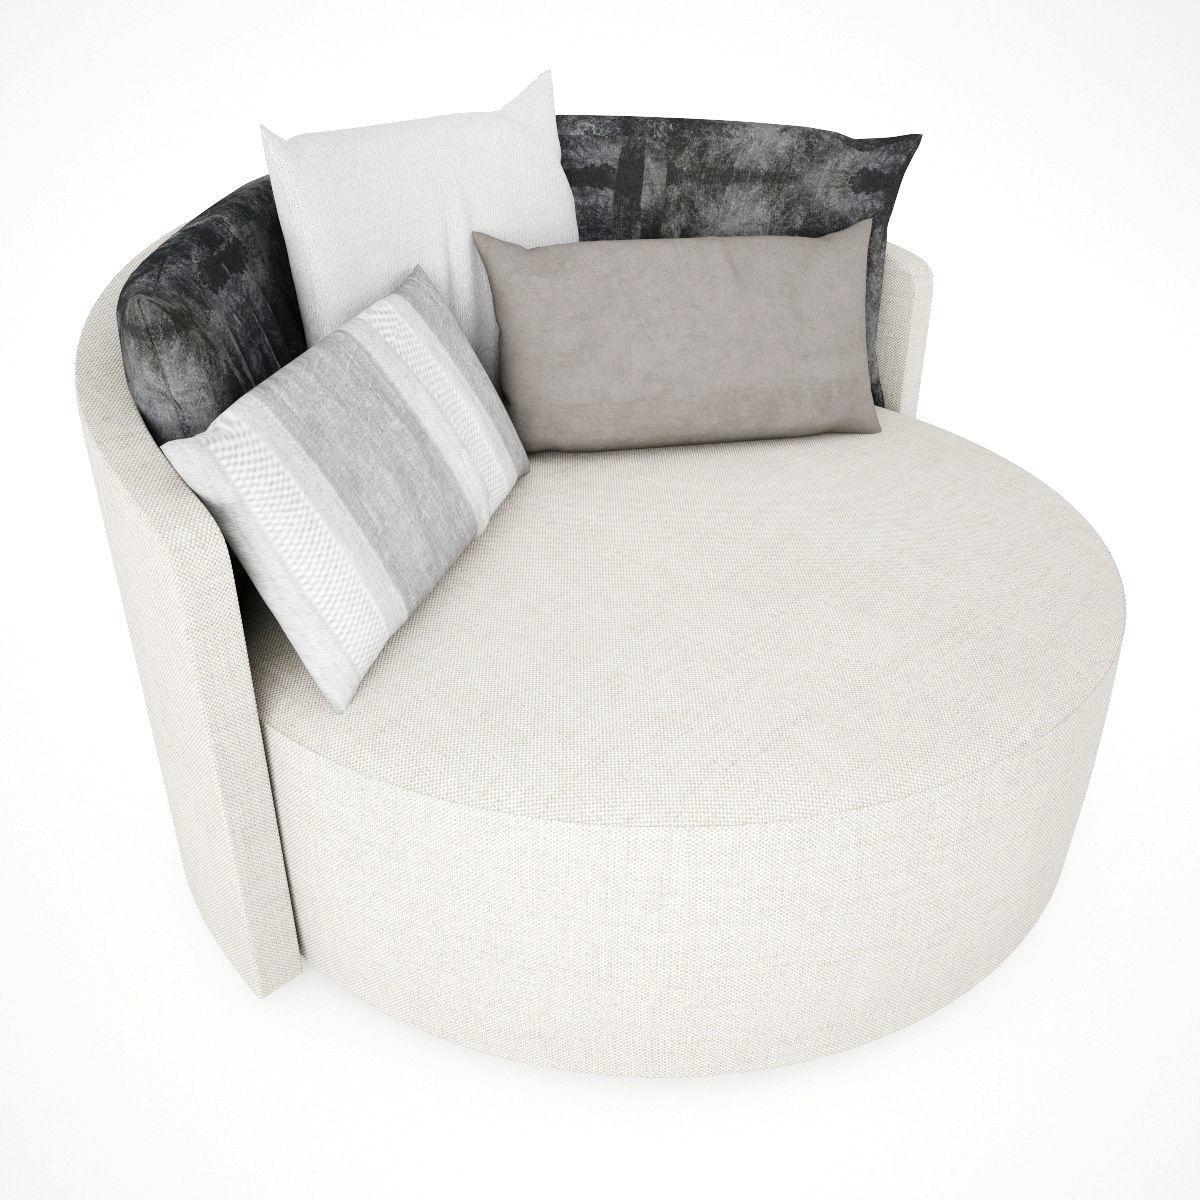 3D Design Single Sofa   CGTrader